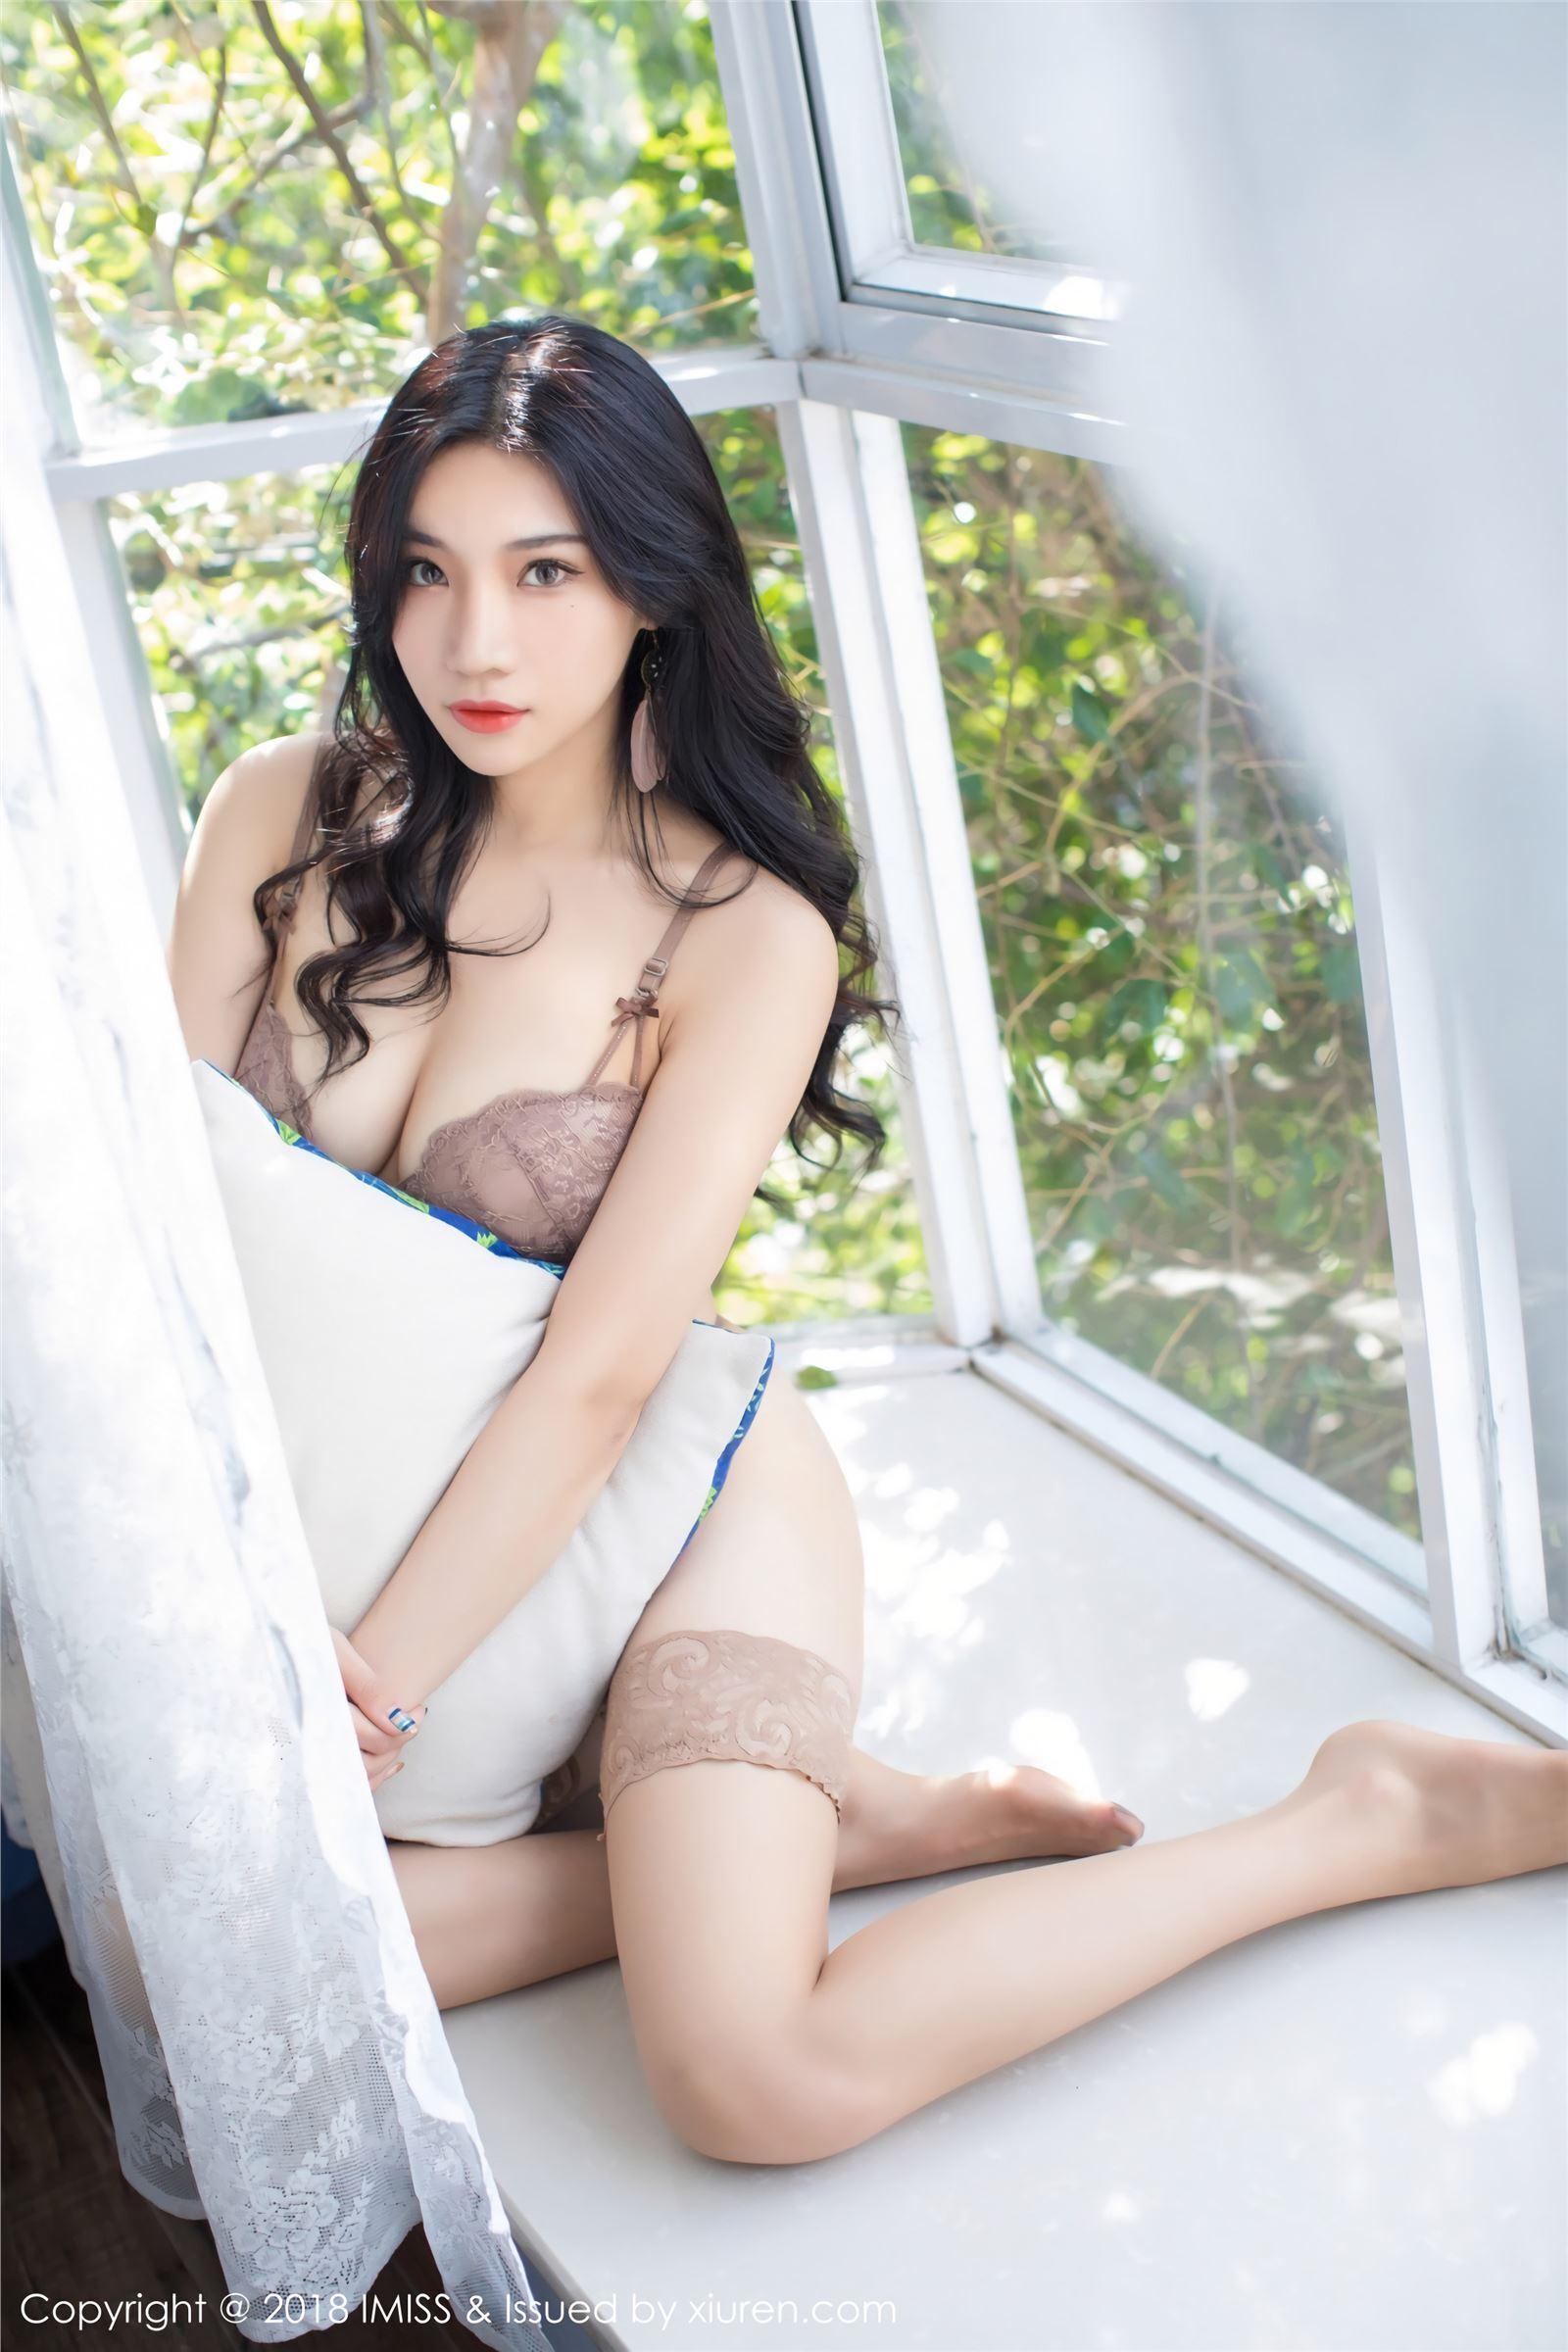 IMiss爱蜜社 写真 2018.02.13 VOL.218 丝袜美腿 小狐狸Sica